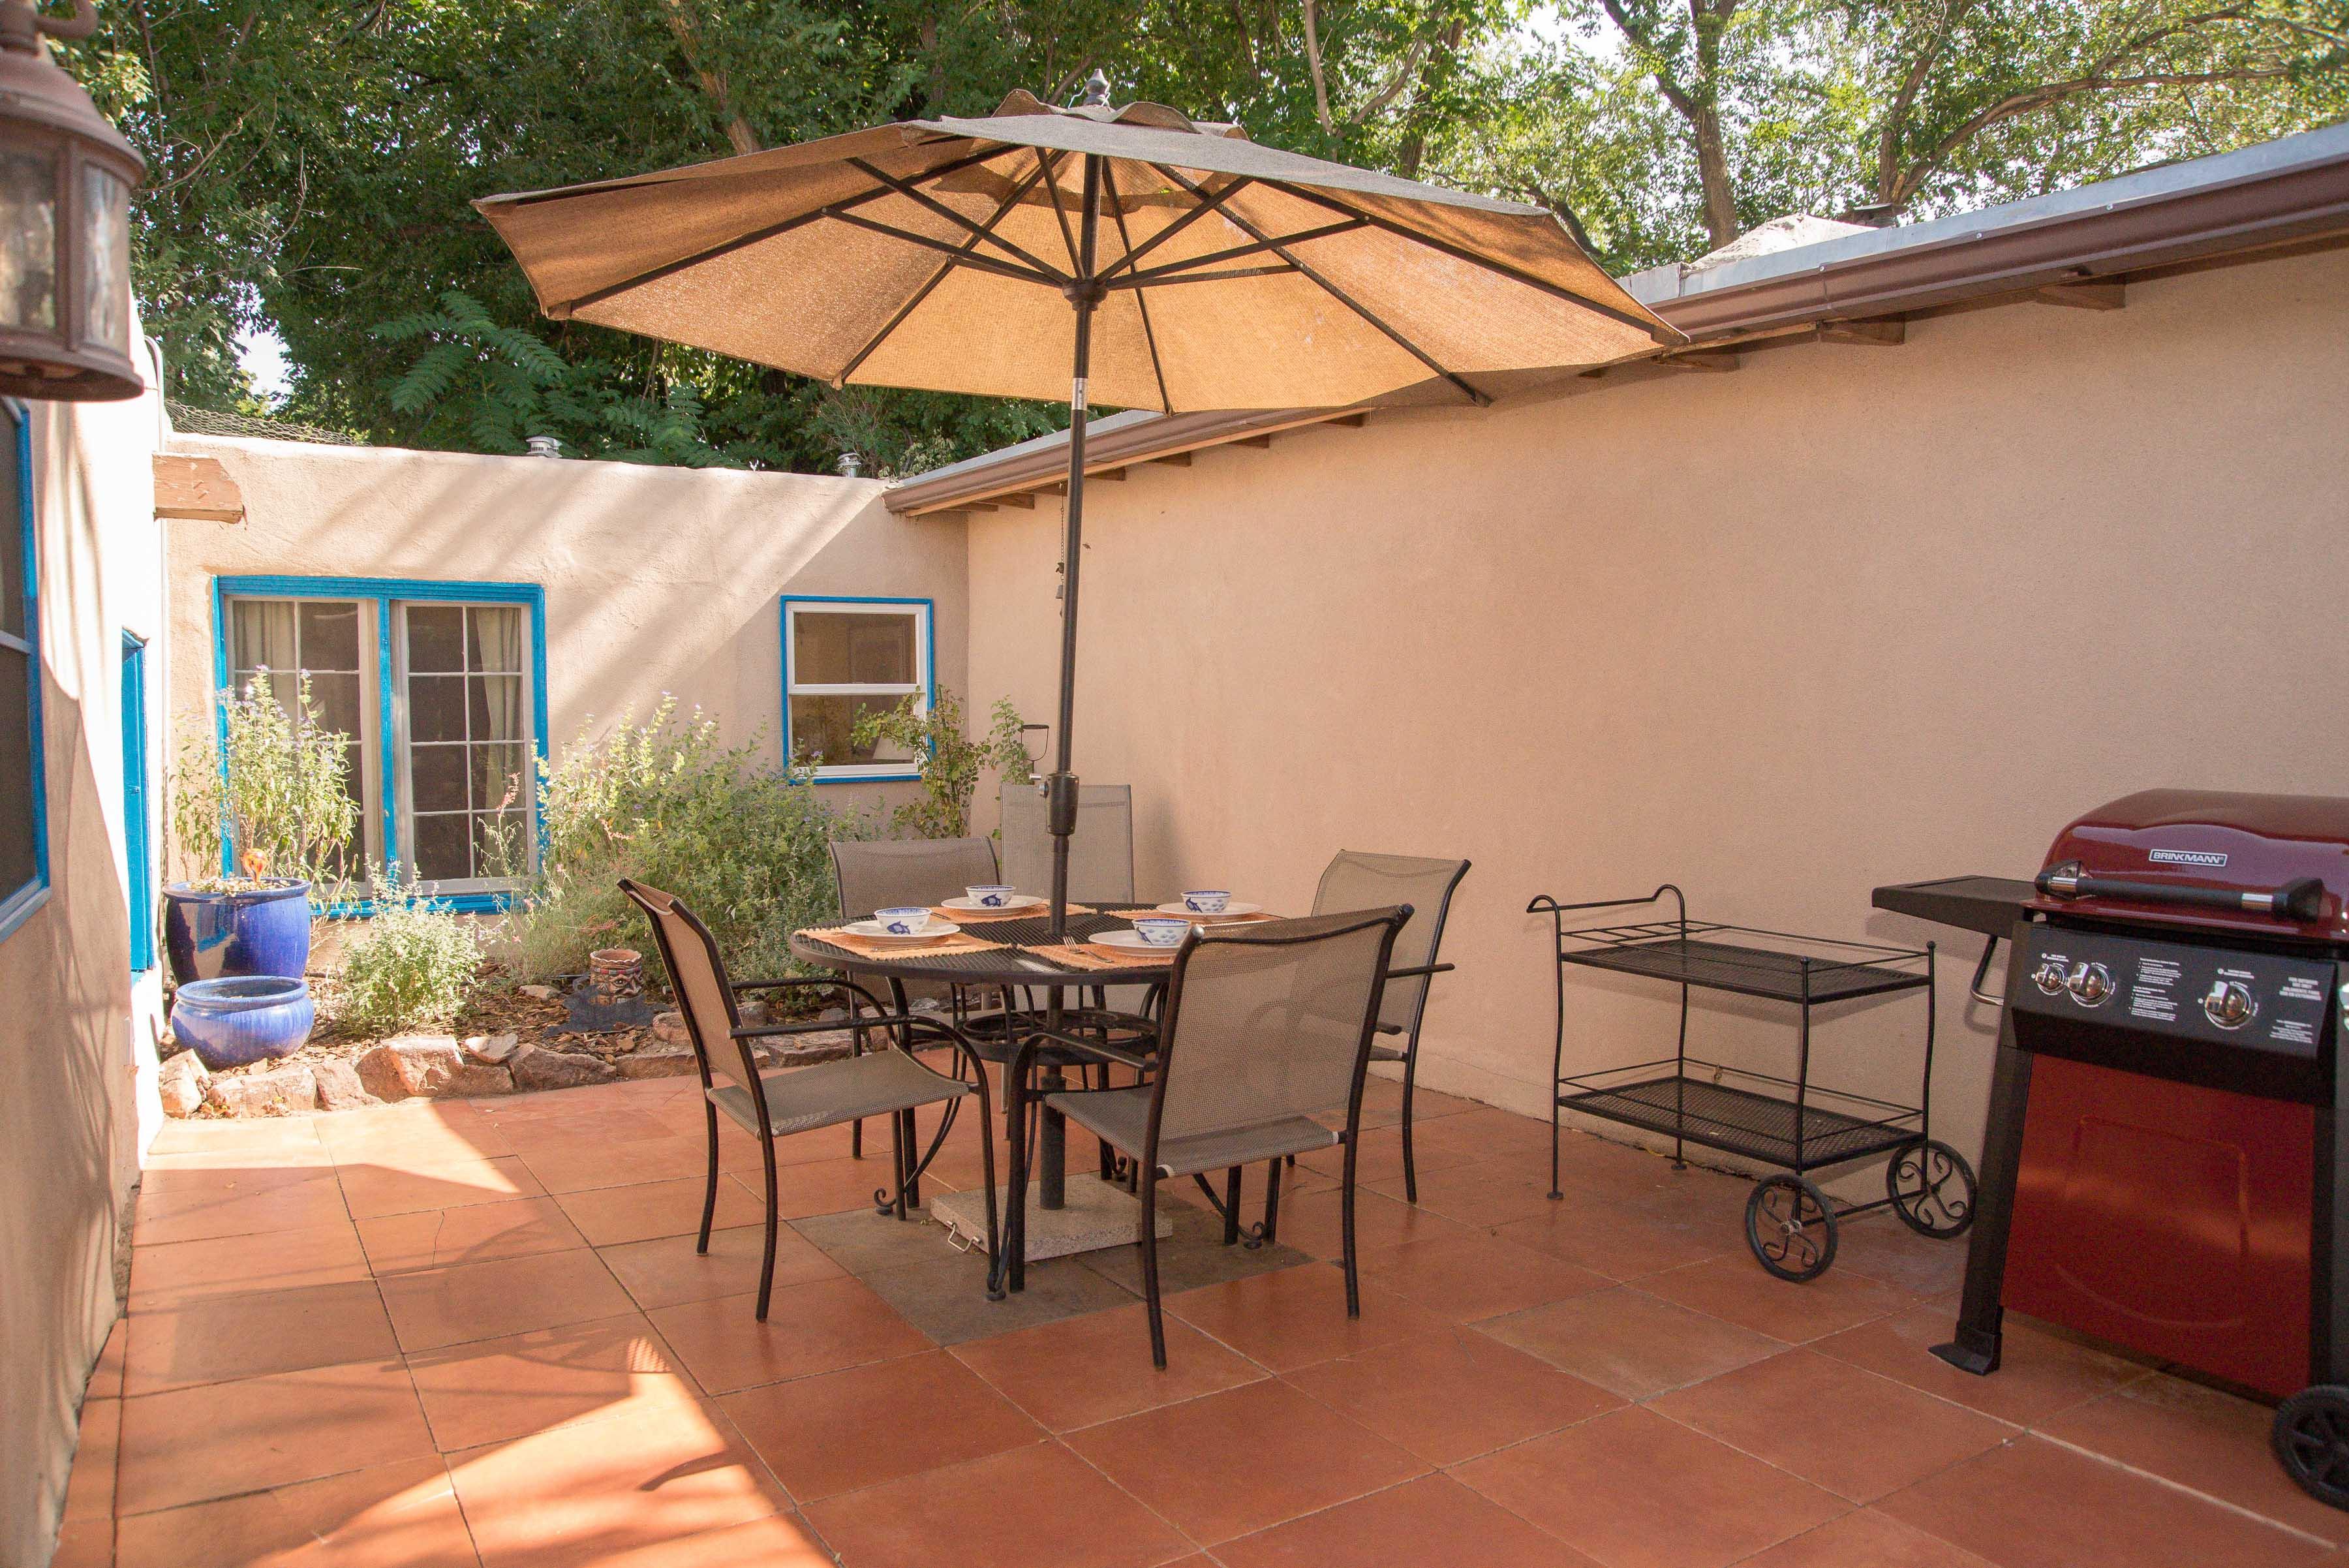 Casa Carolina – Original 2 Bedroom Adobe Home – Walking distance